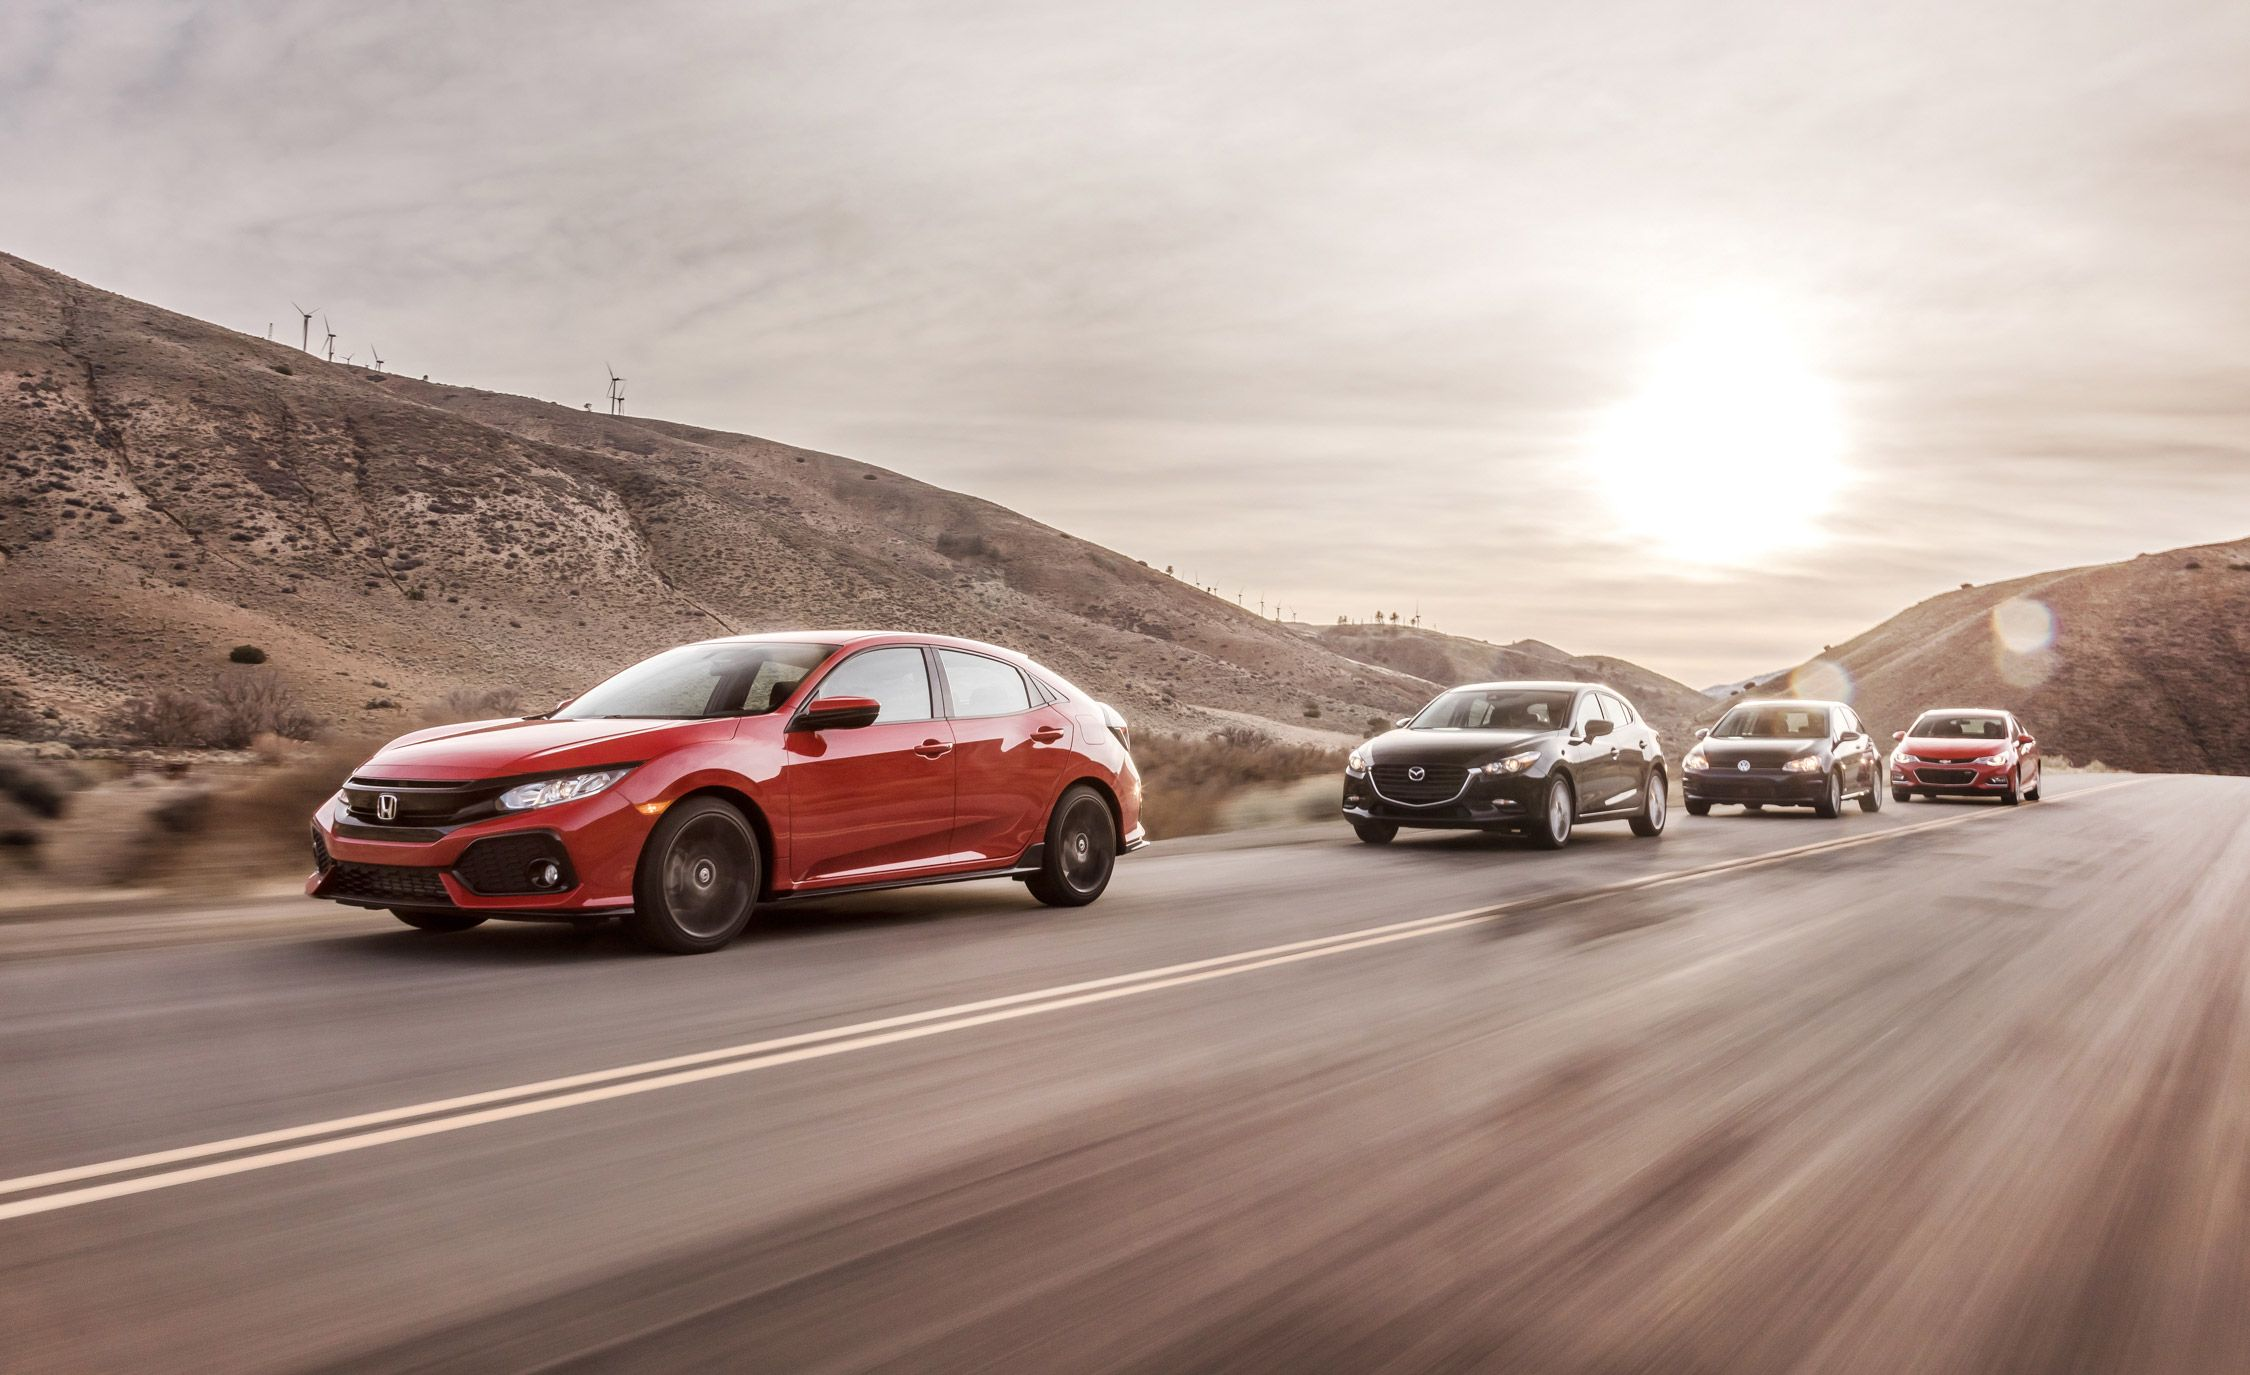 2017 Chevrolet Cruze LT RS Vs. 2017 Honda Civic Sport, 2017 Mazda 3 Touring